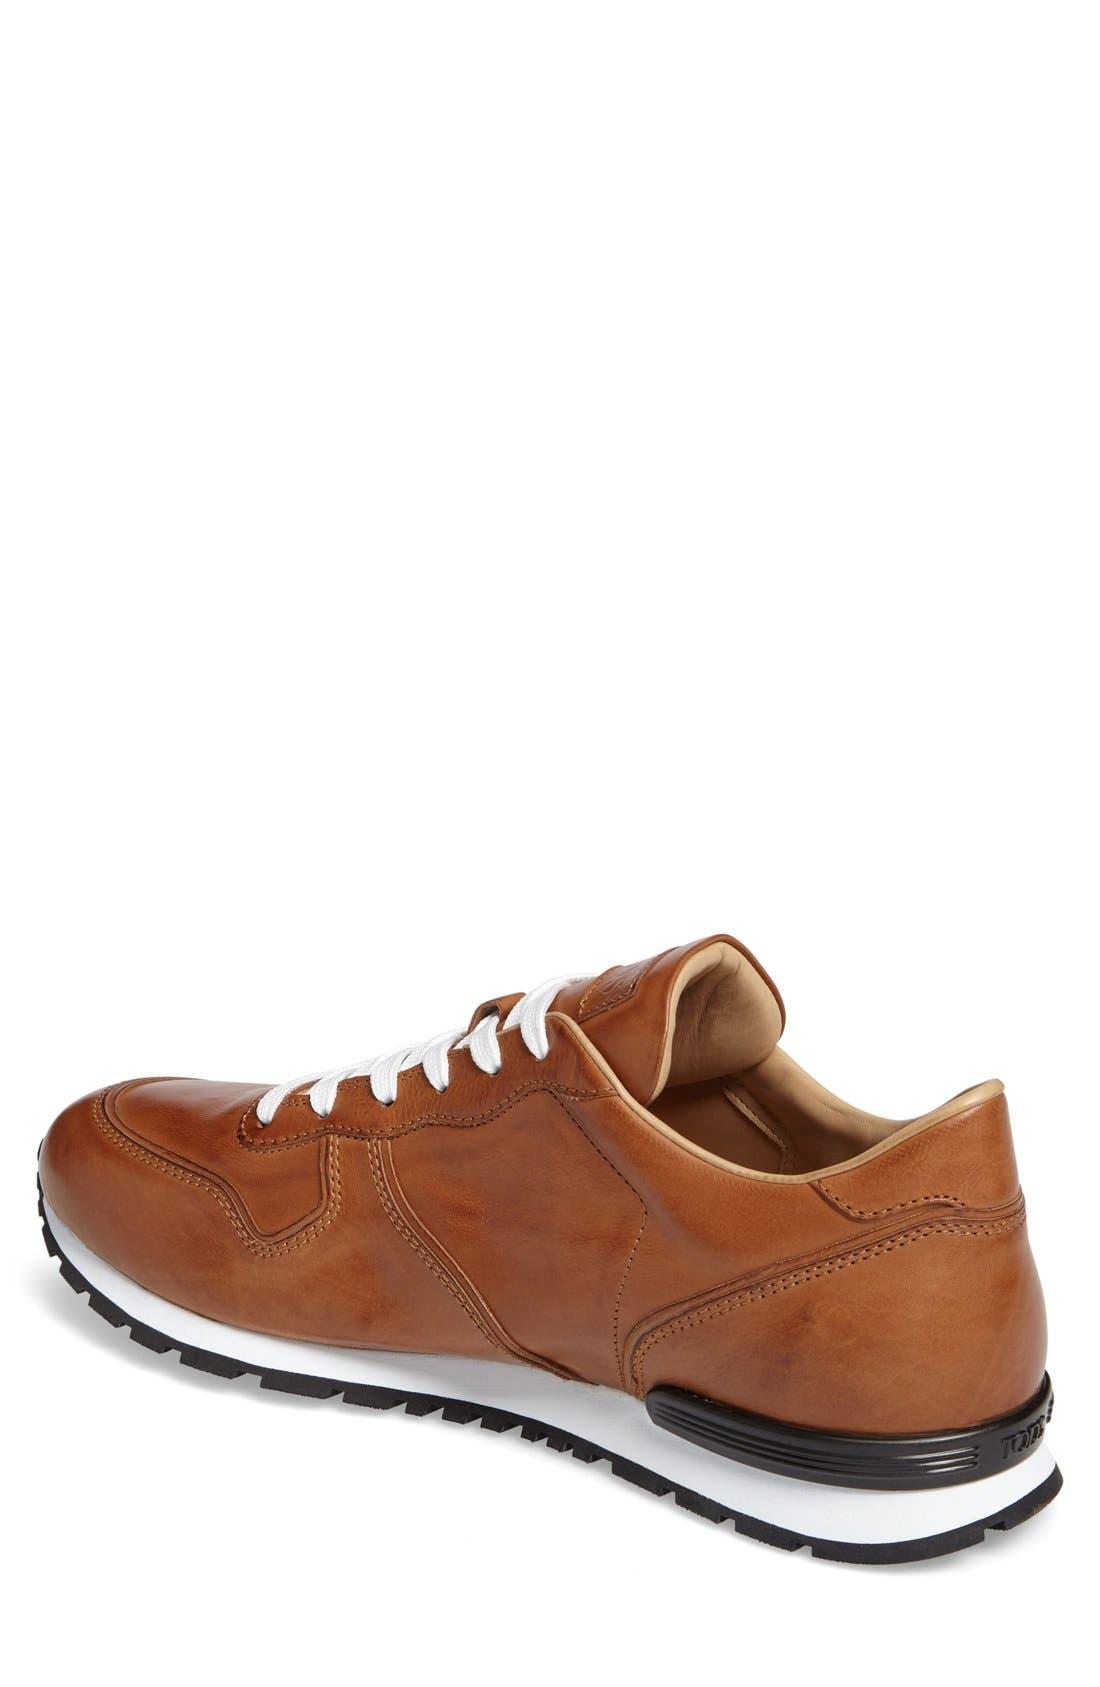 'Allacciato' Sneaker,                             Alternate thumbnail 13, color,